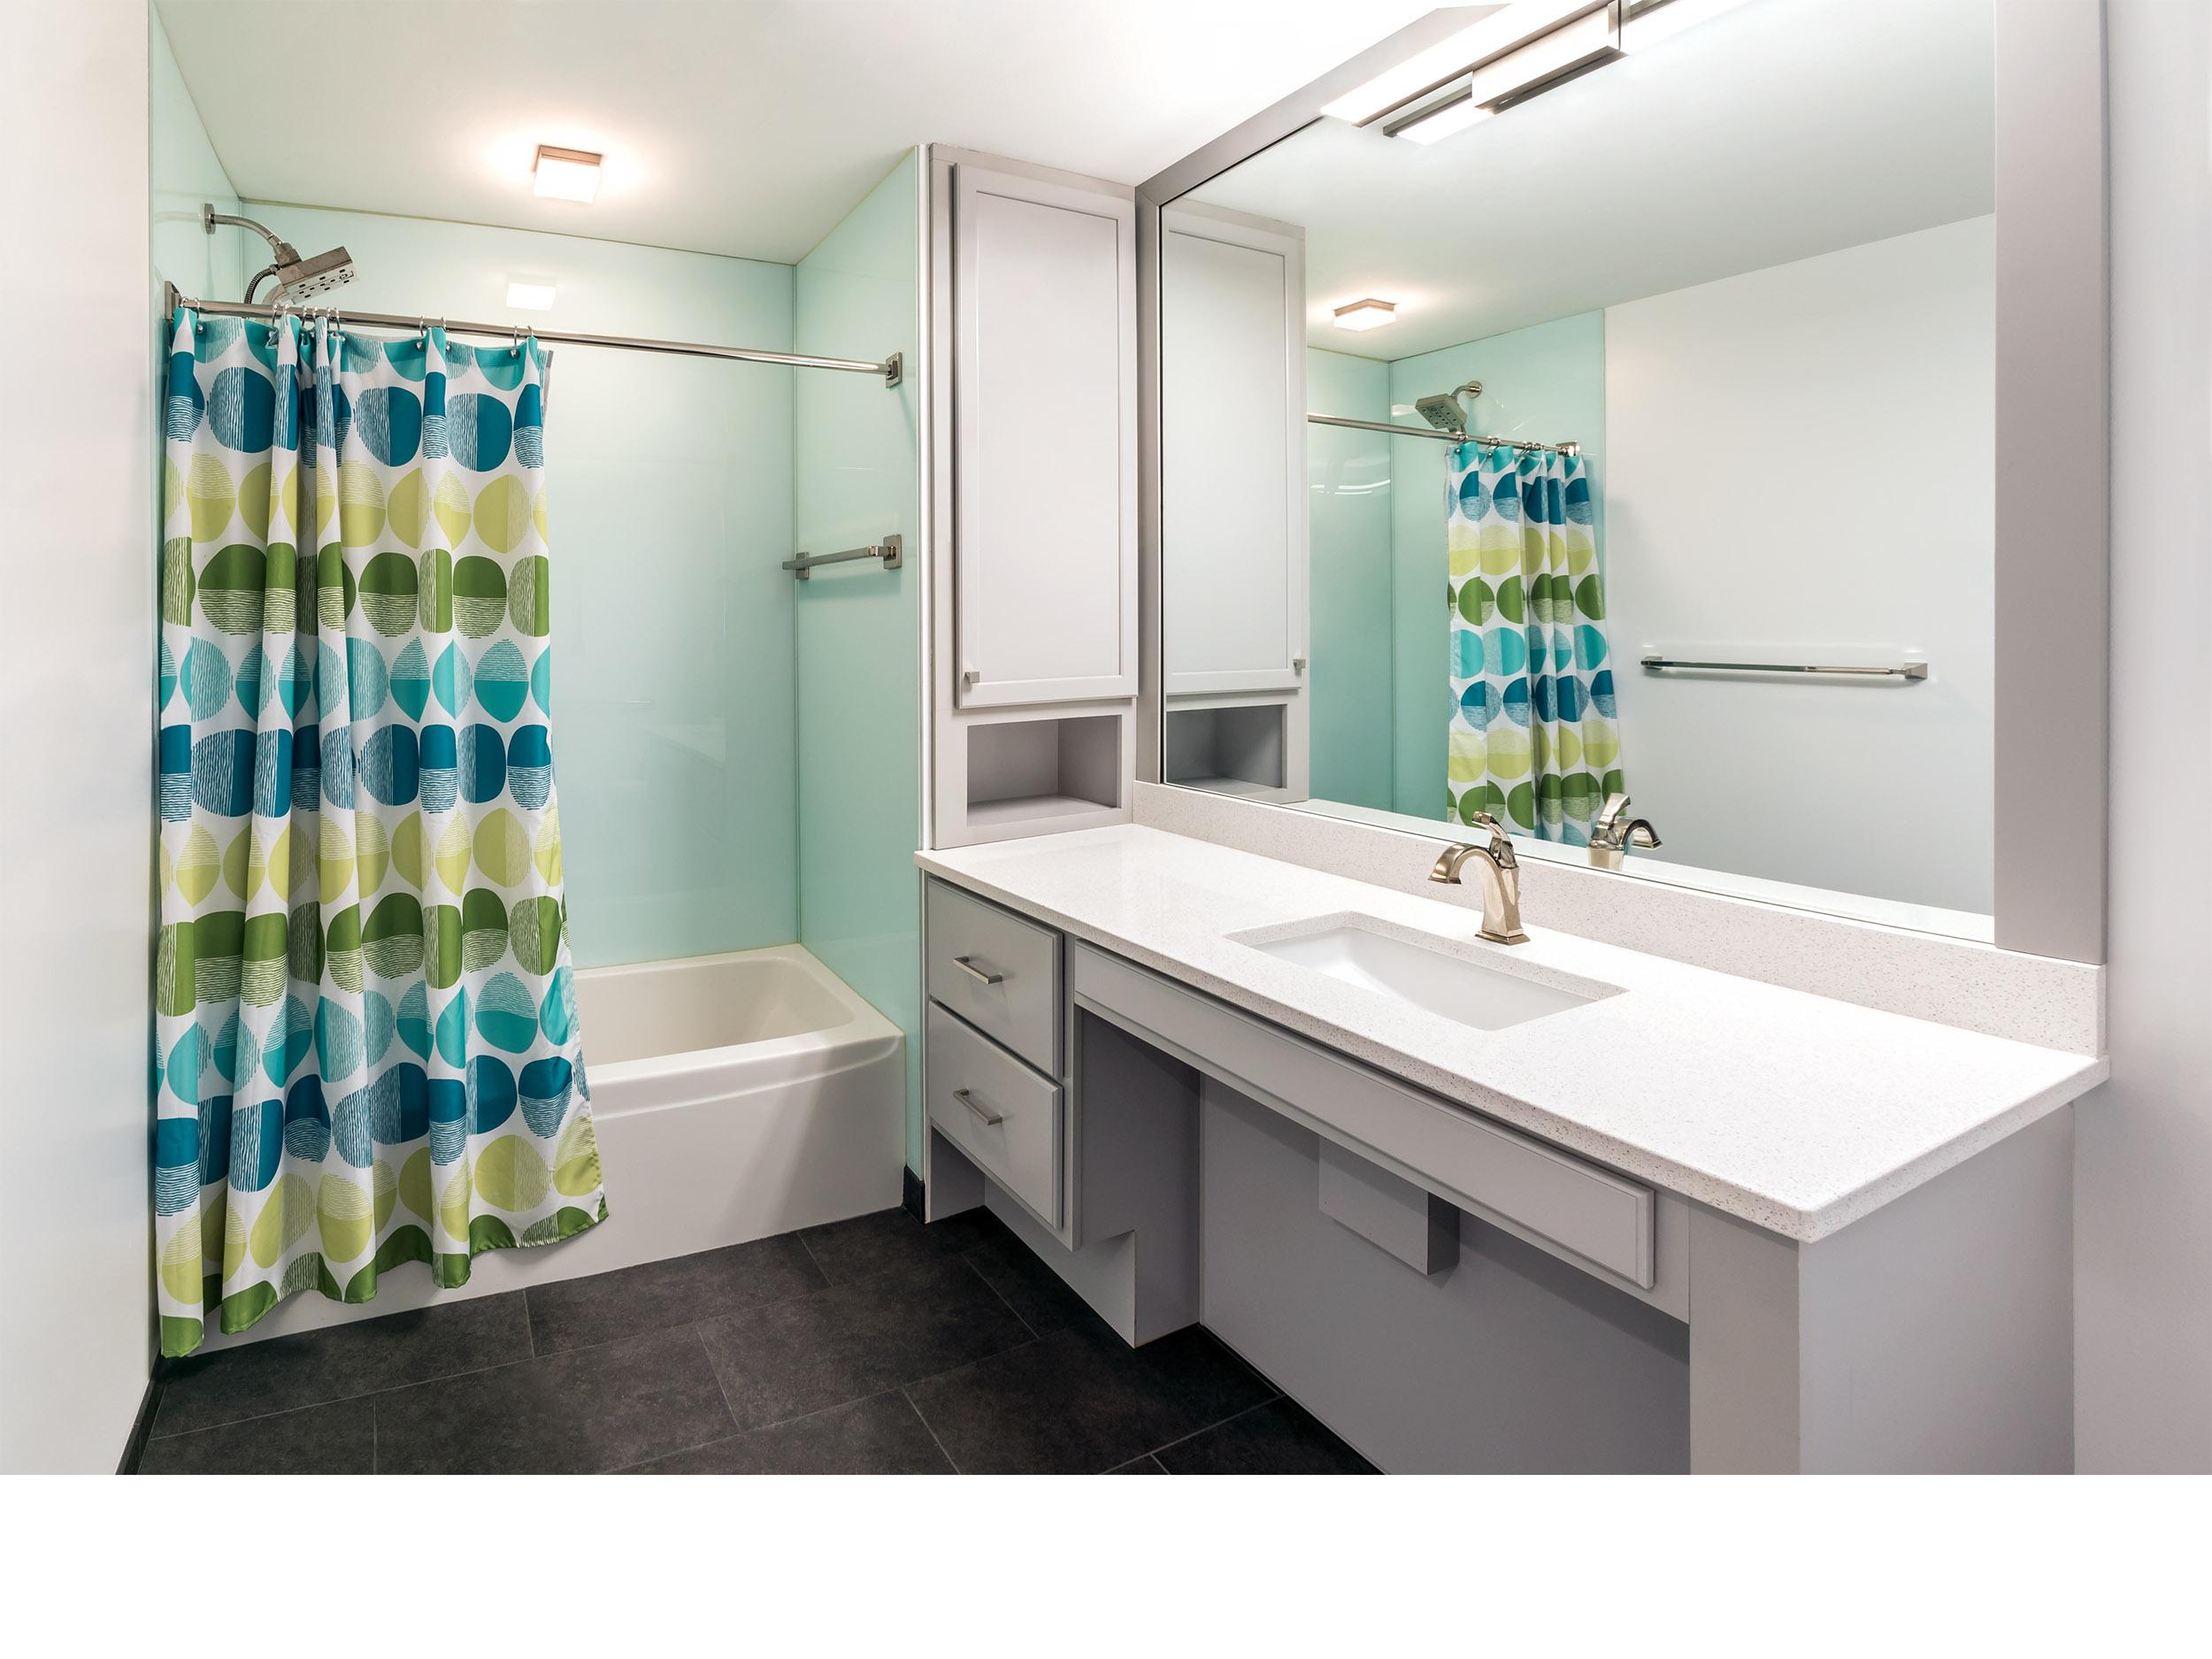 RAMBLER REDO — ALTER URBAN ARCHITECTURE on log home bathroom designs, french country bathroom designs, split level bathroom designs, farm house bathroom designs, transitional bathroom designs,